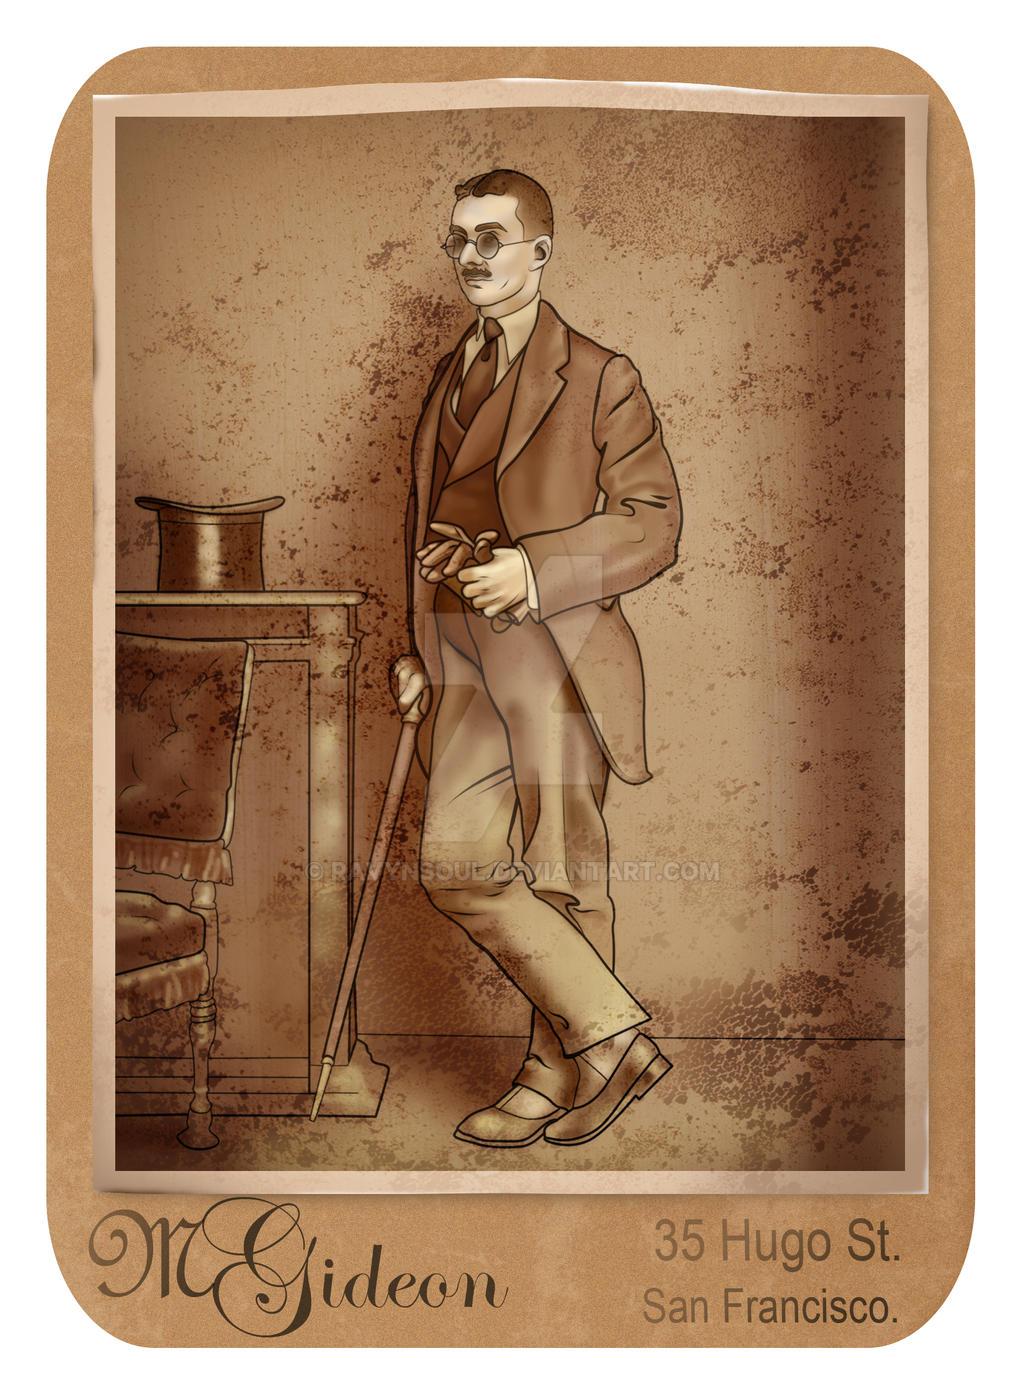 Gideon Dossier Picture